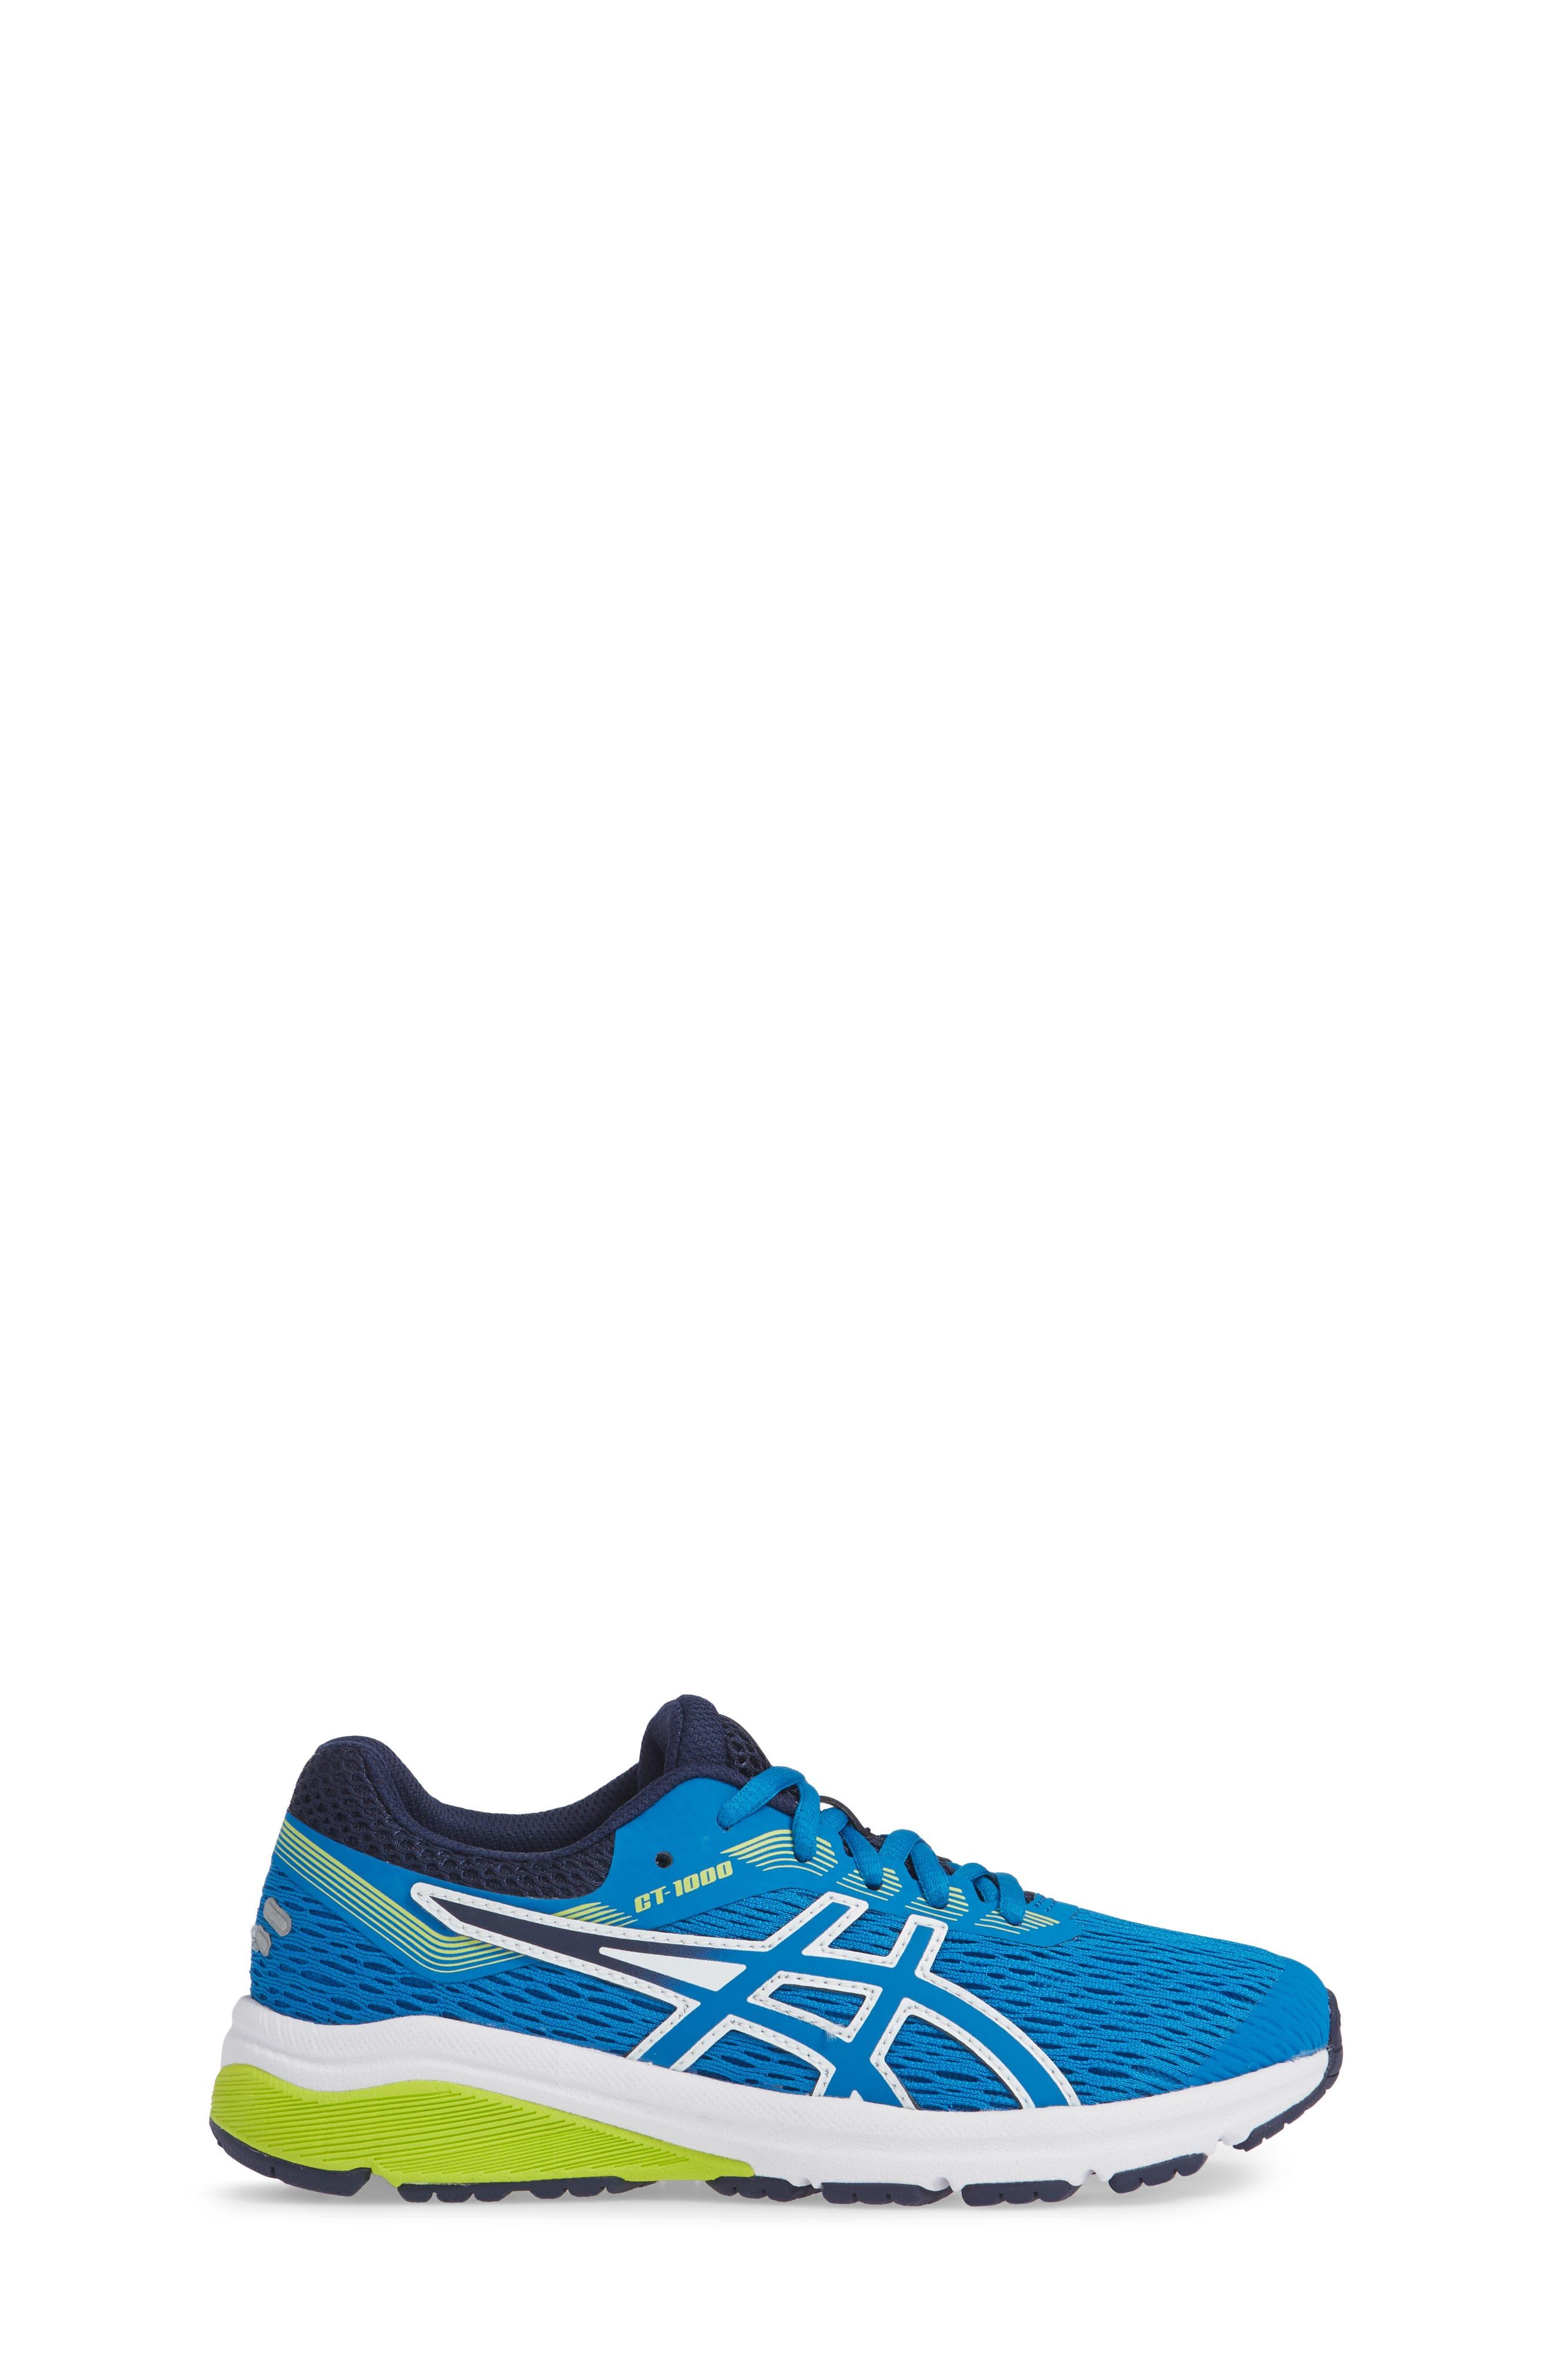 GT 1000 7 Running Shoe,                             Alternate thumbnail 3, color,                             RACE BLUE/ NEON LIME